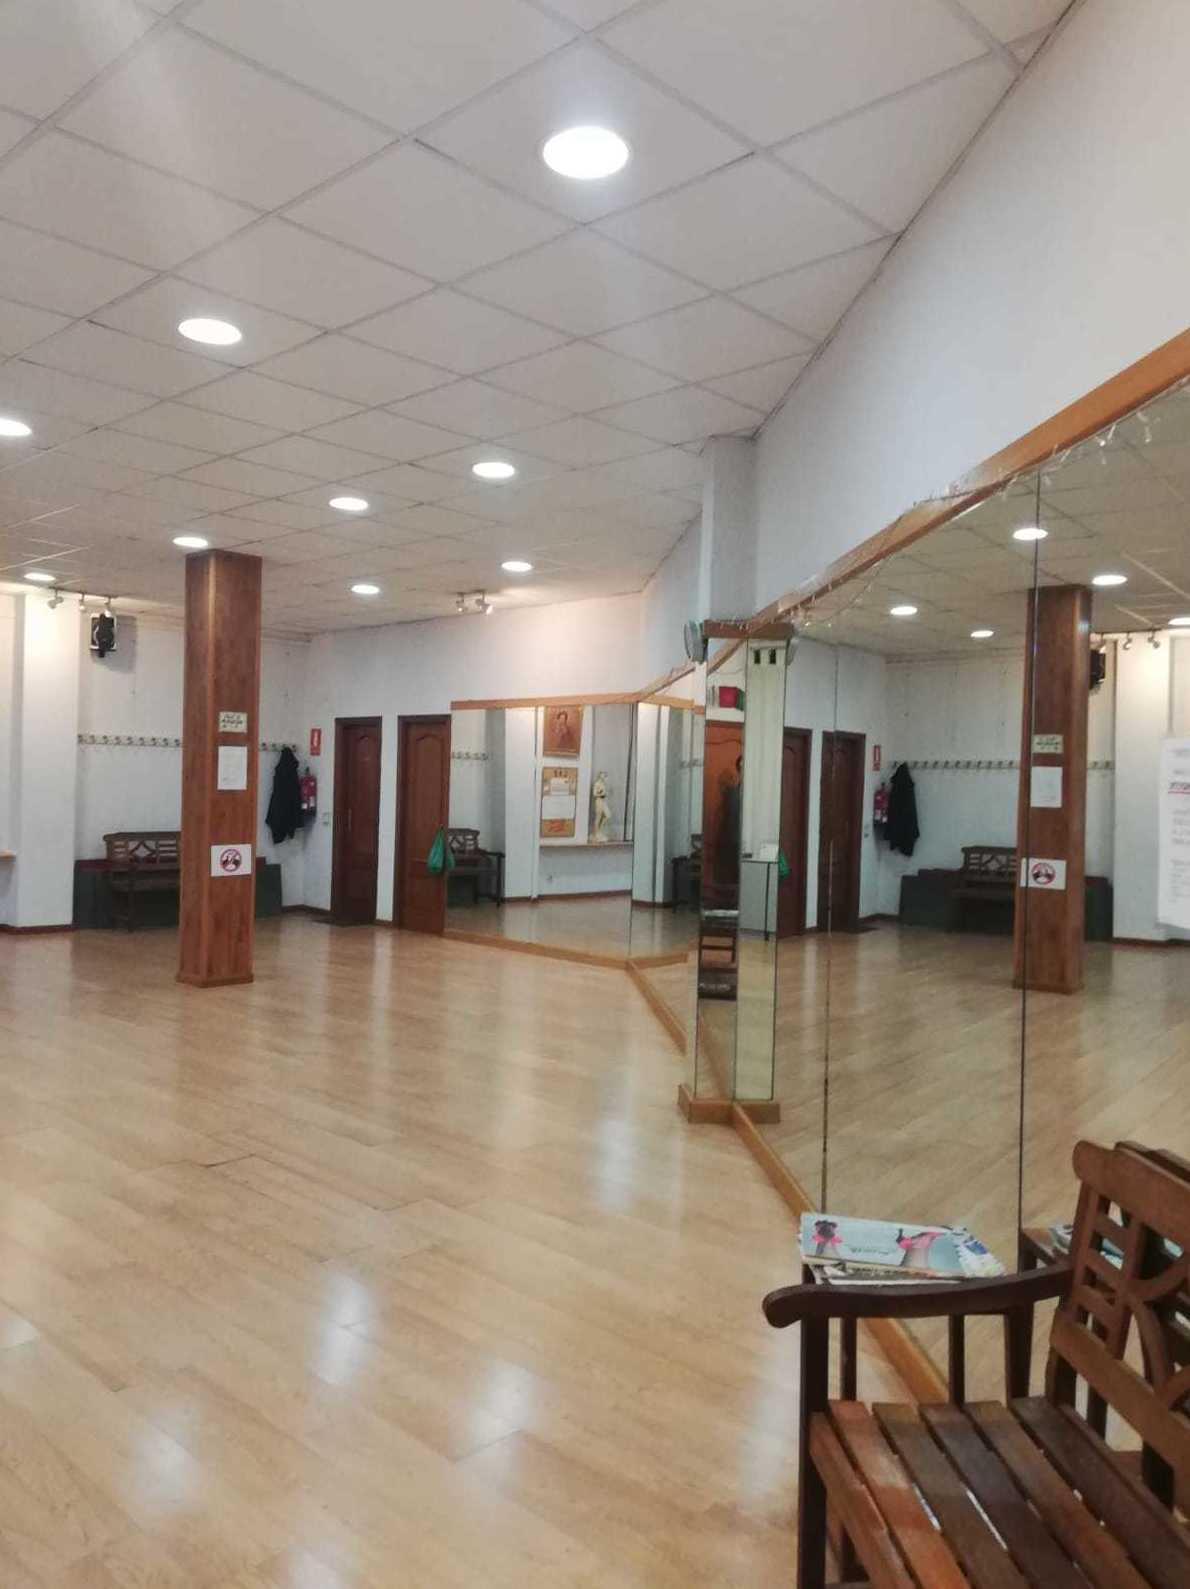 Foto 2 de Academias de bailes de salón en  | CAB - Baile